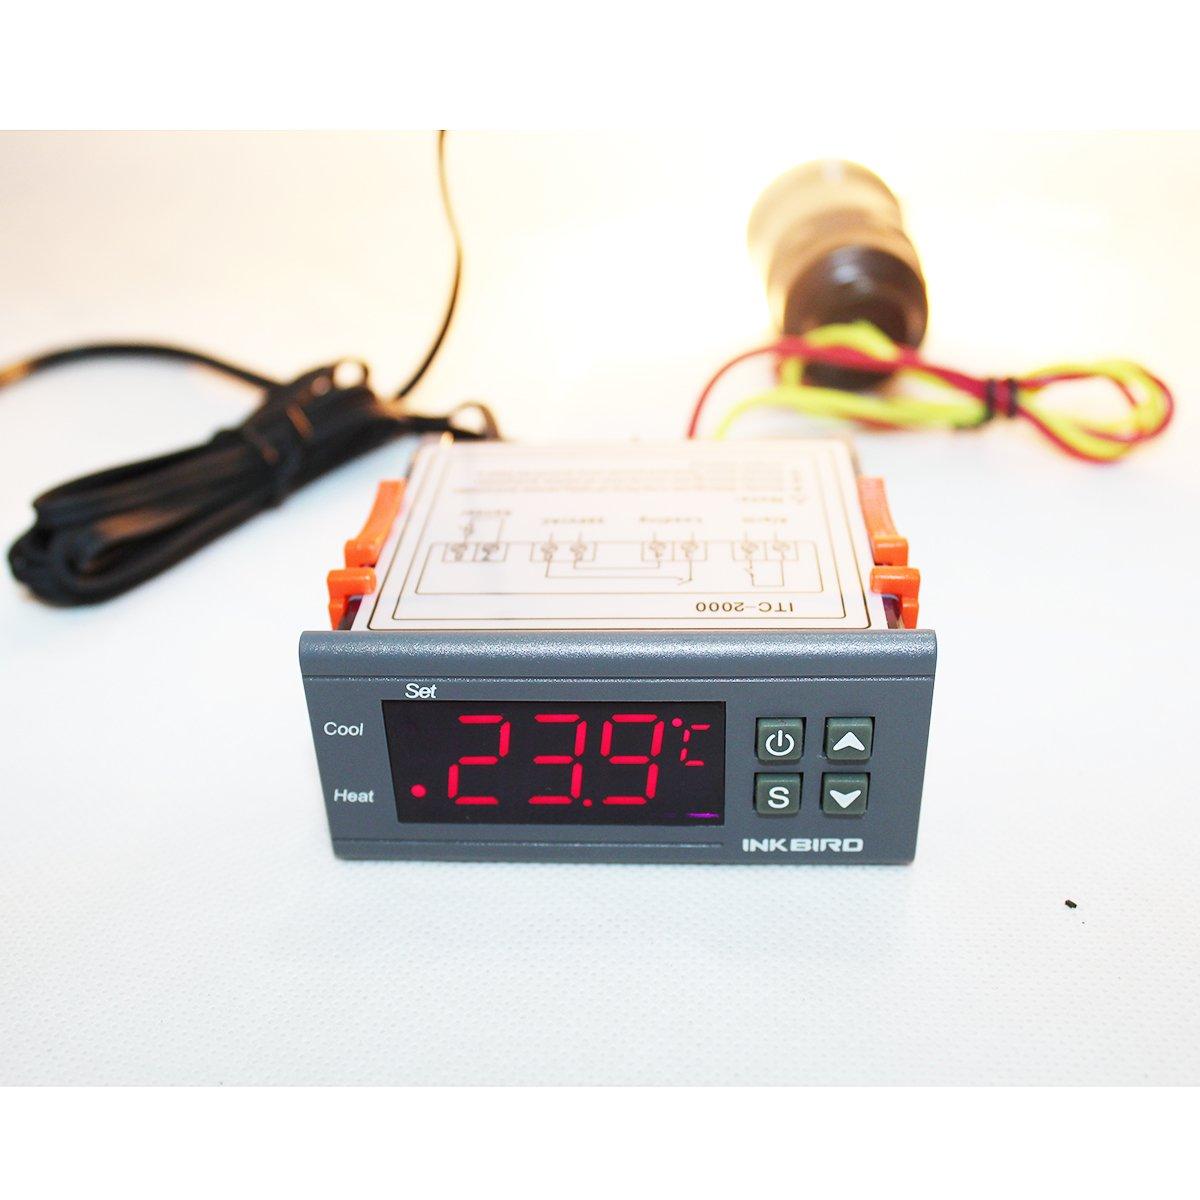 Inkbird ITC-100VL Digital PID 12V 24V Regulador De Temperatura Termostato del Calentador